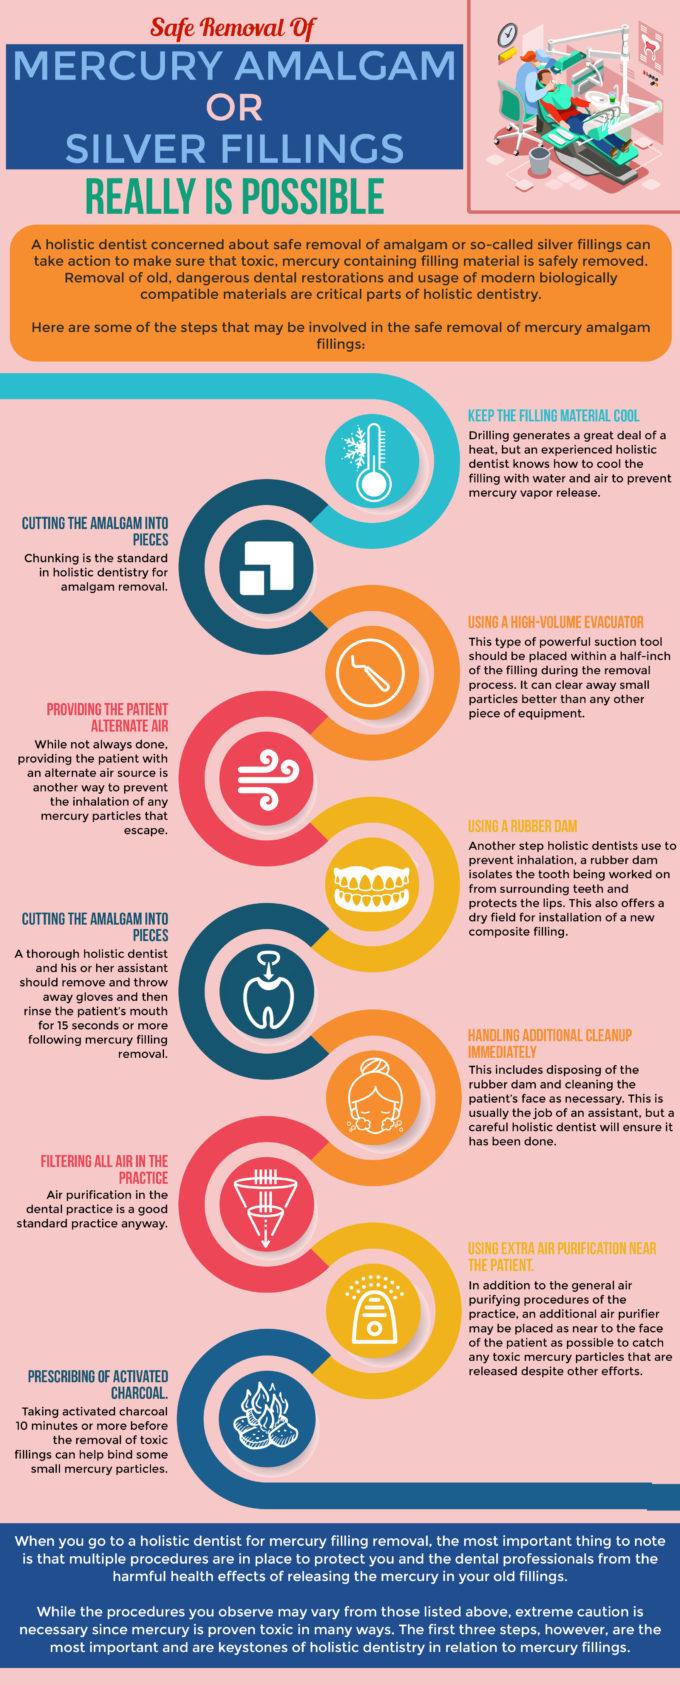 Safe Removal of Mercury Amalgams Infographic